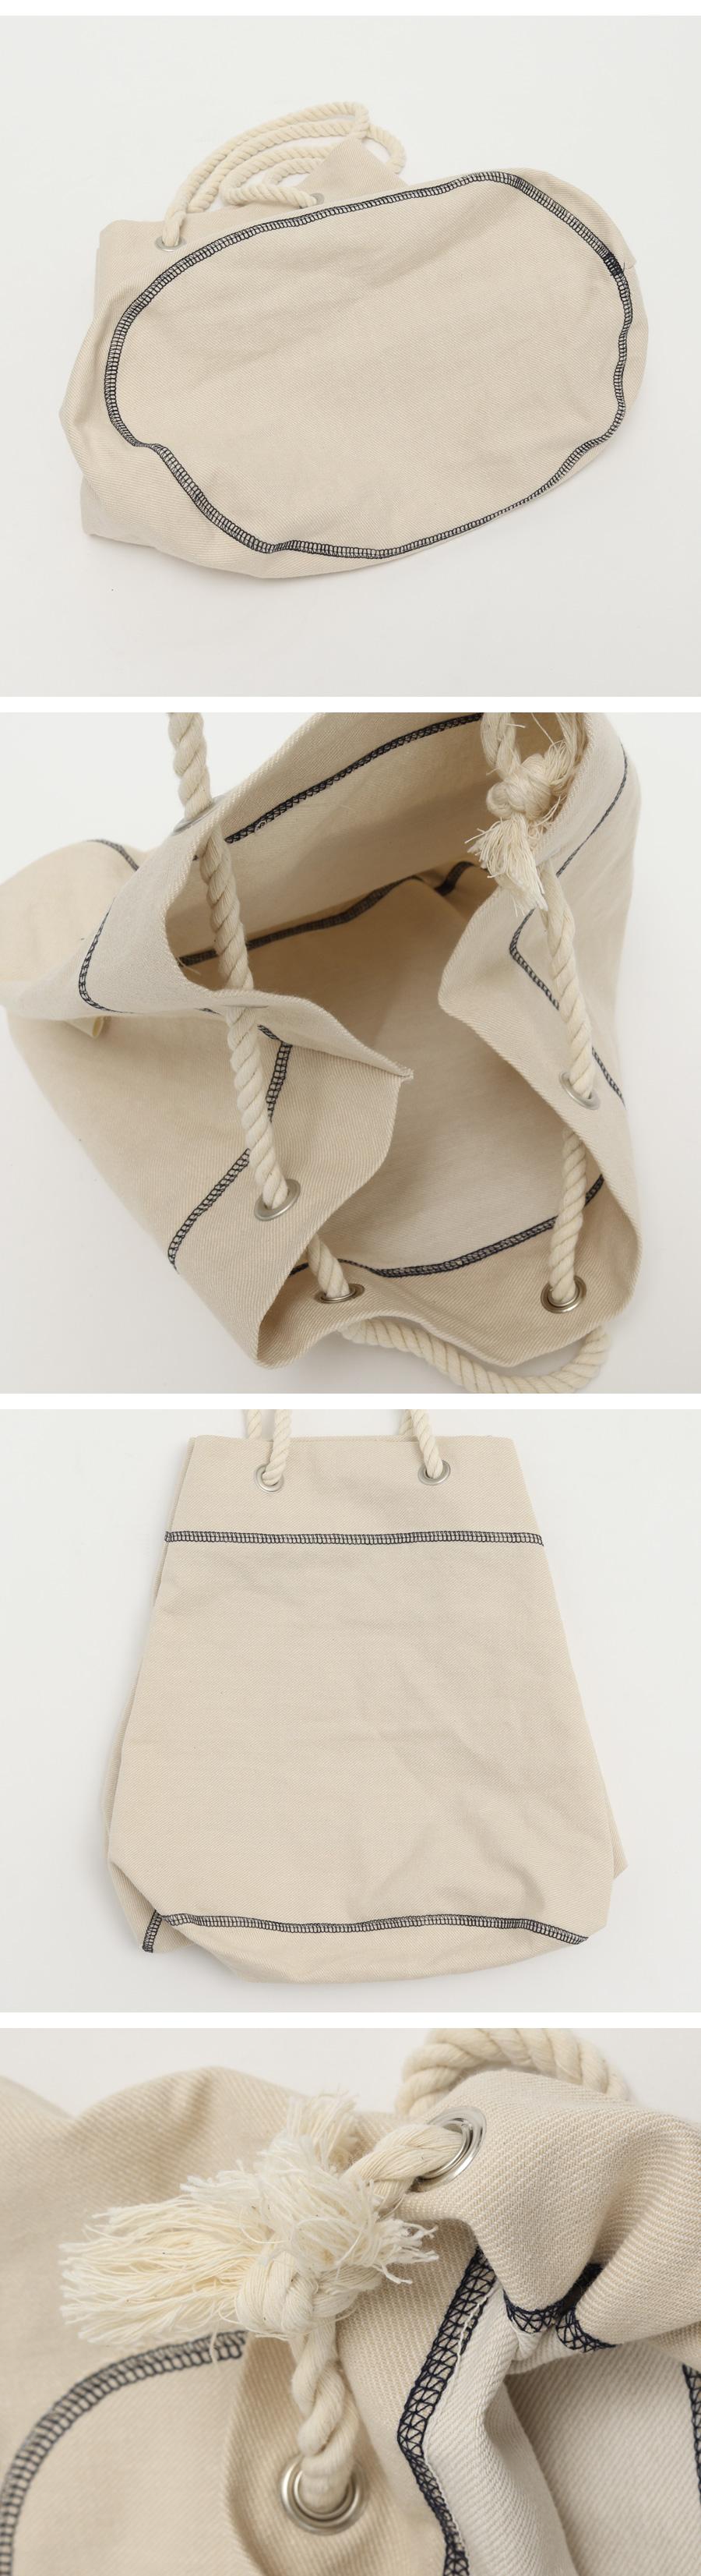 Rope stitch pocket bag_C